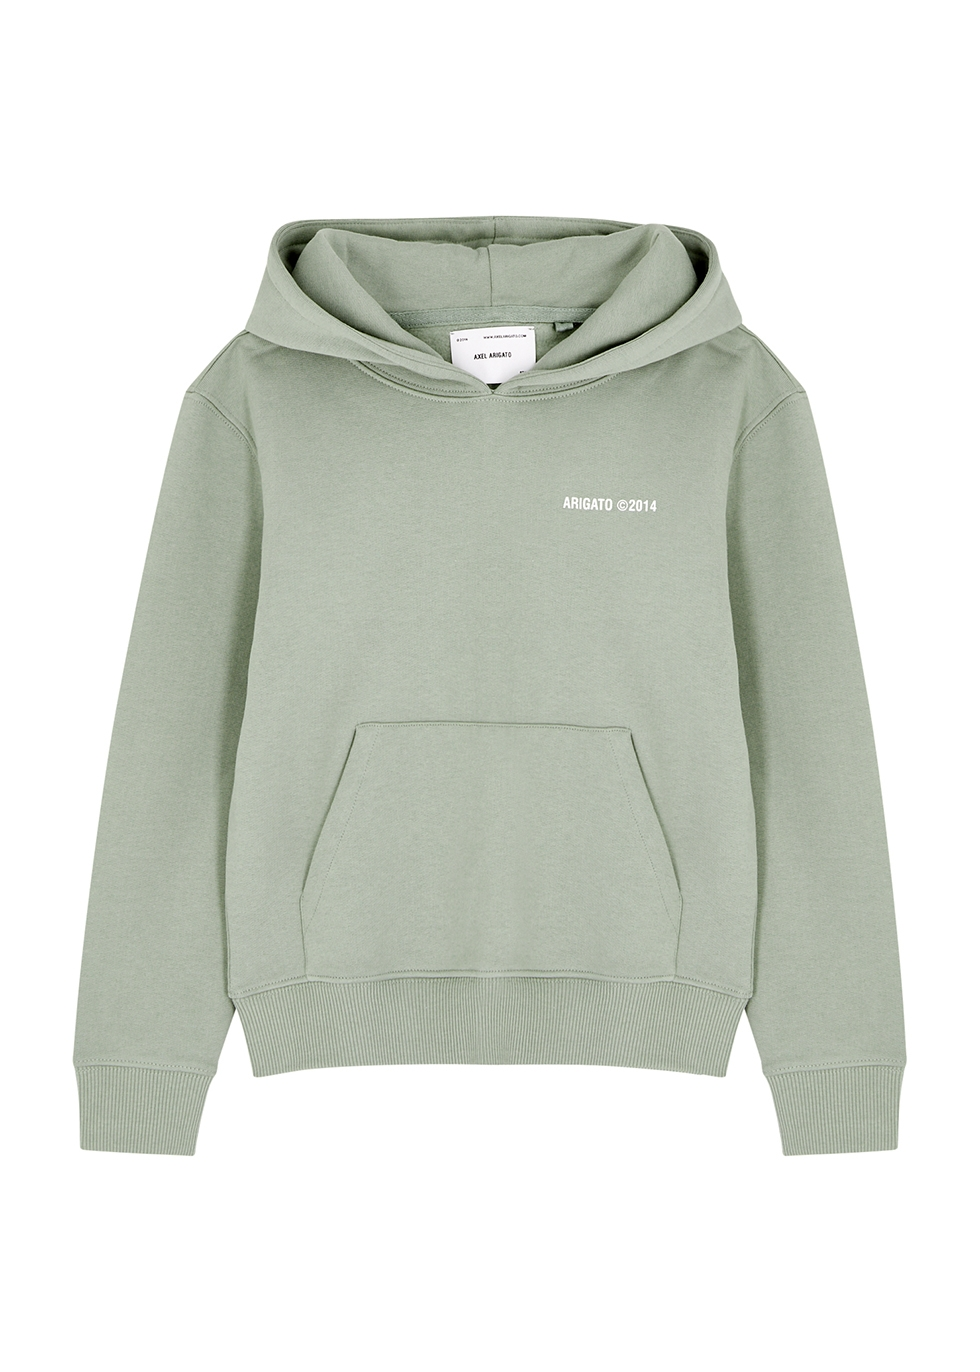 London sage hooded cotton sweatshirt